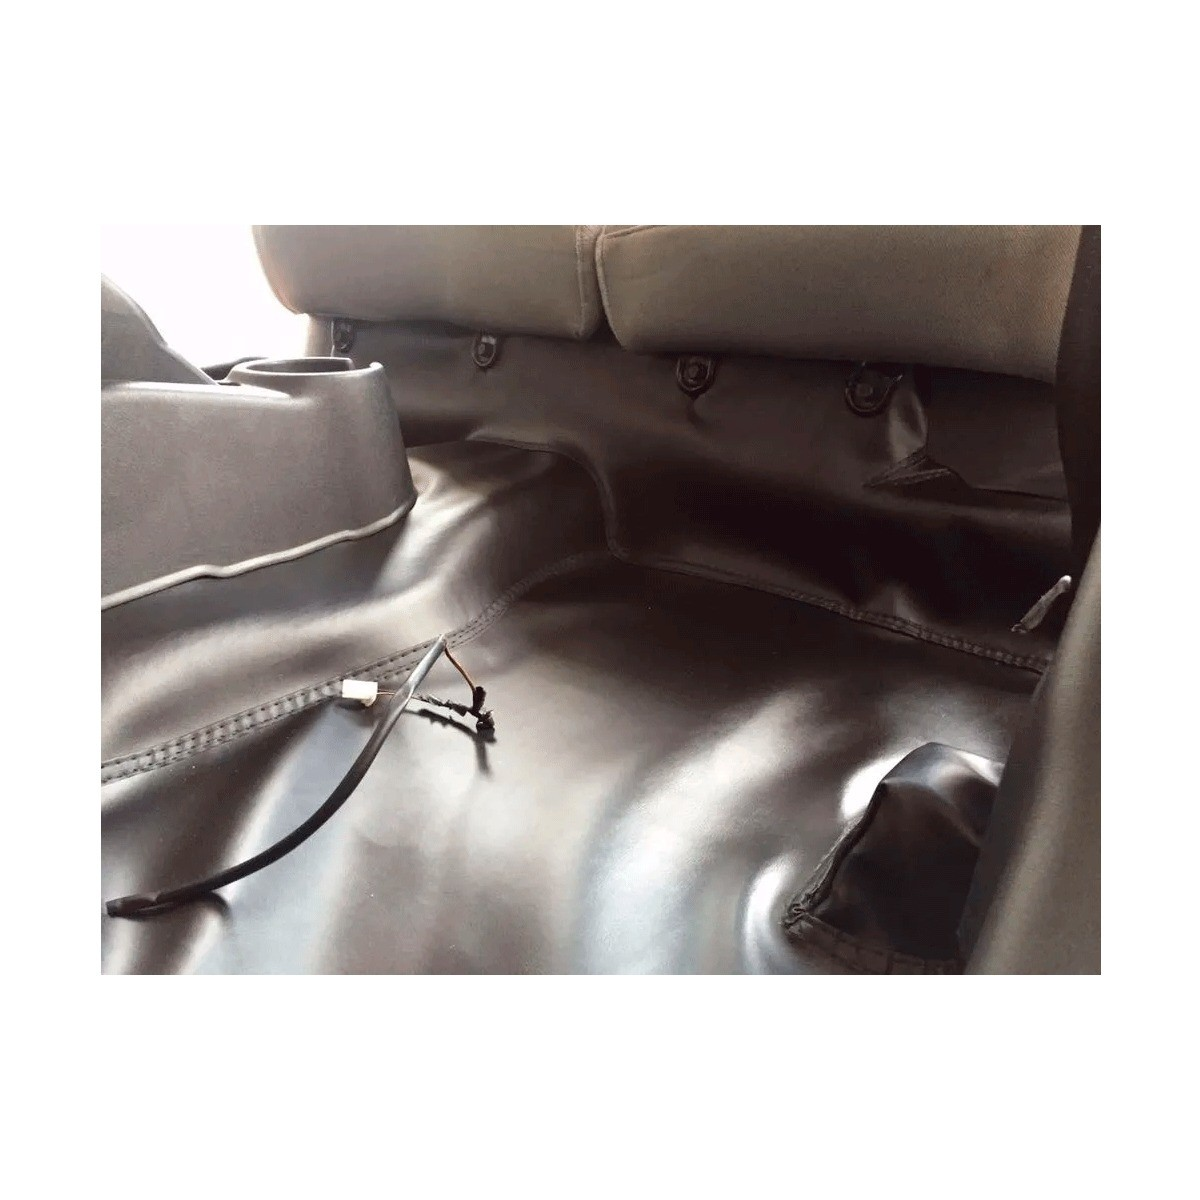 Tapete Automotivo Assoalho Emborrachado Bidim Chevrolet A10 D10 C10 Simples